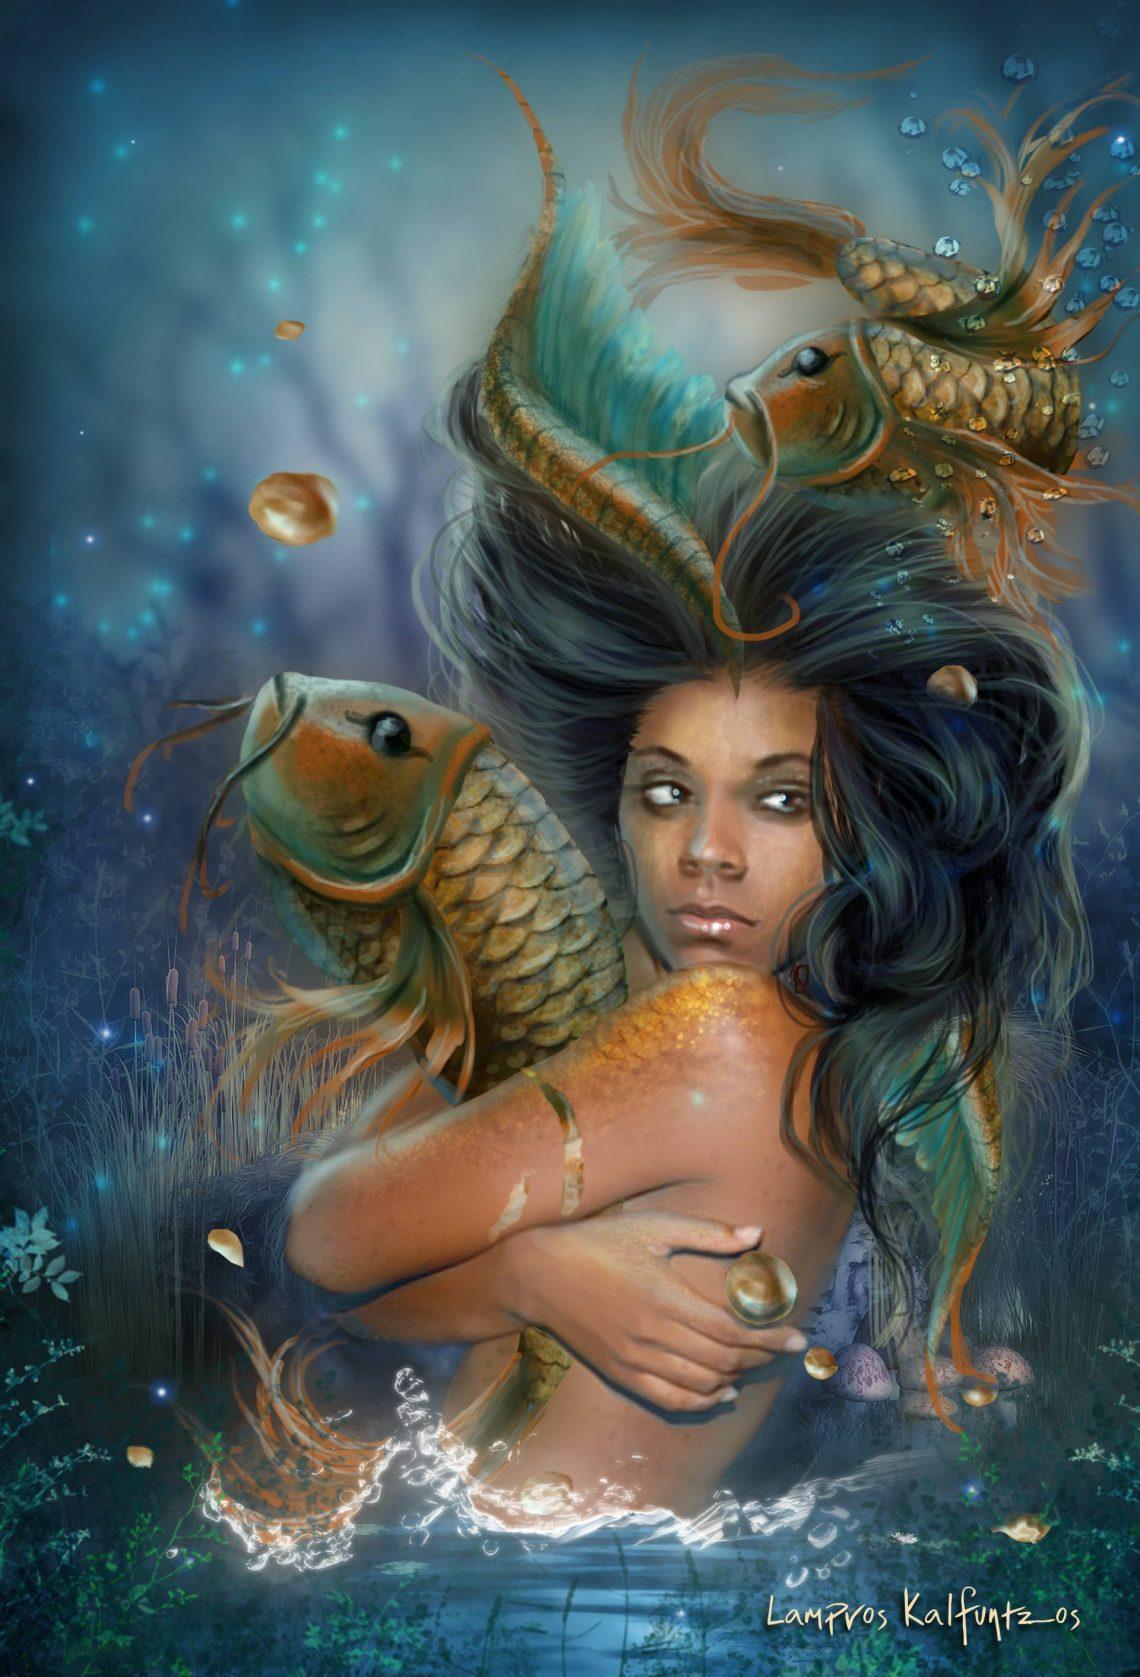 Dangling Dreams Pisces Mermaid by Lampros Kalfuntzos